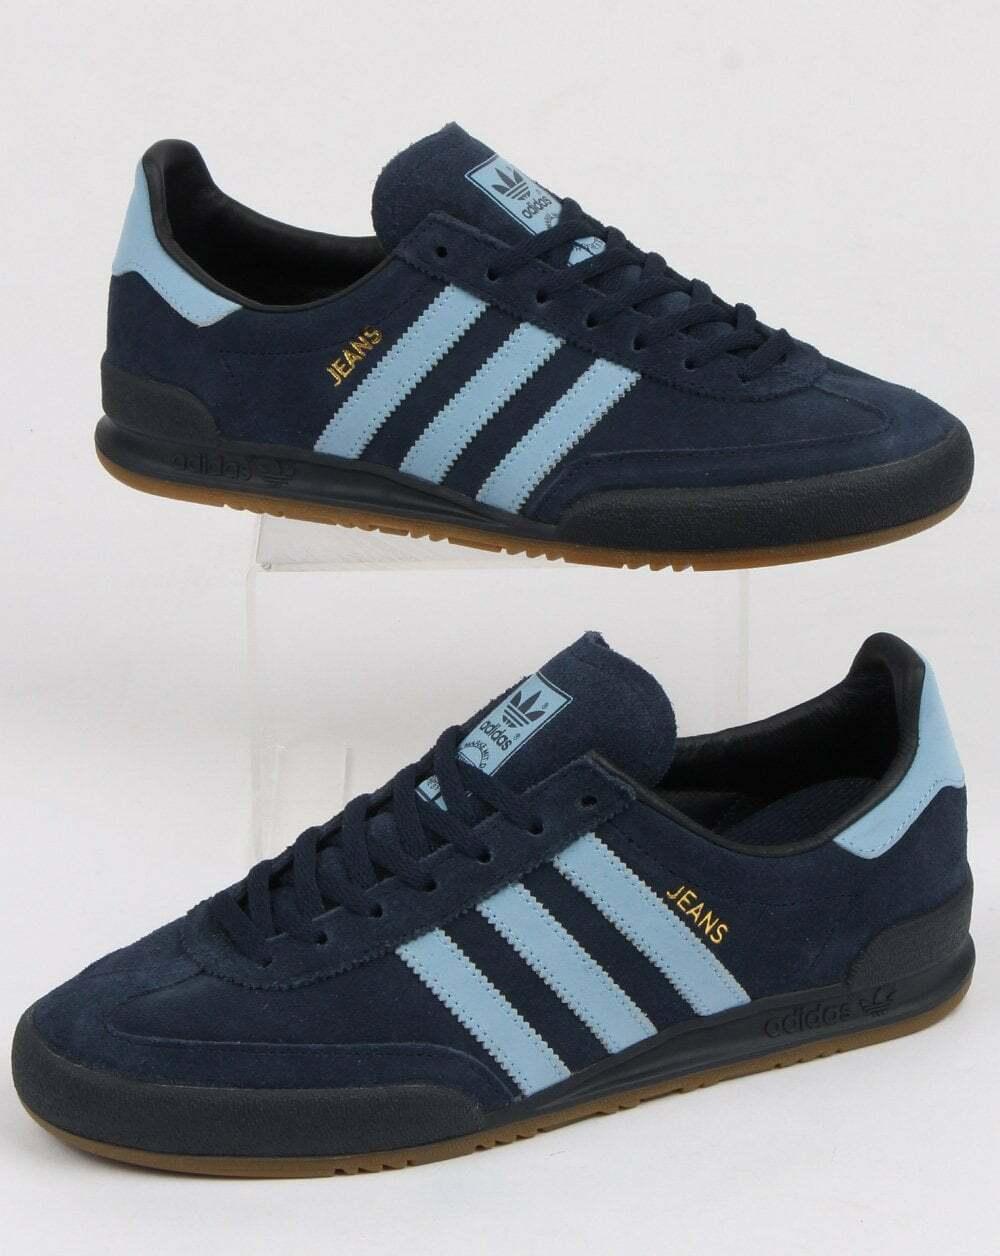 Mens adidas Originals Jeans MKII Mk2 Noble Teal Blue Suede